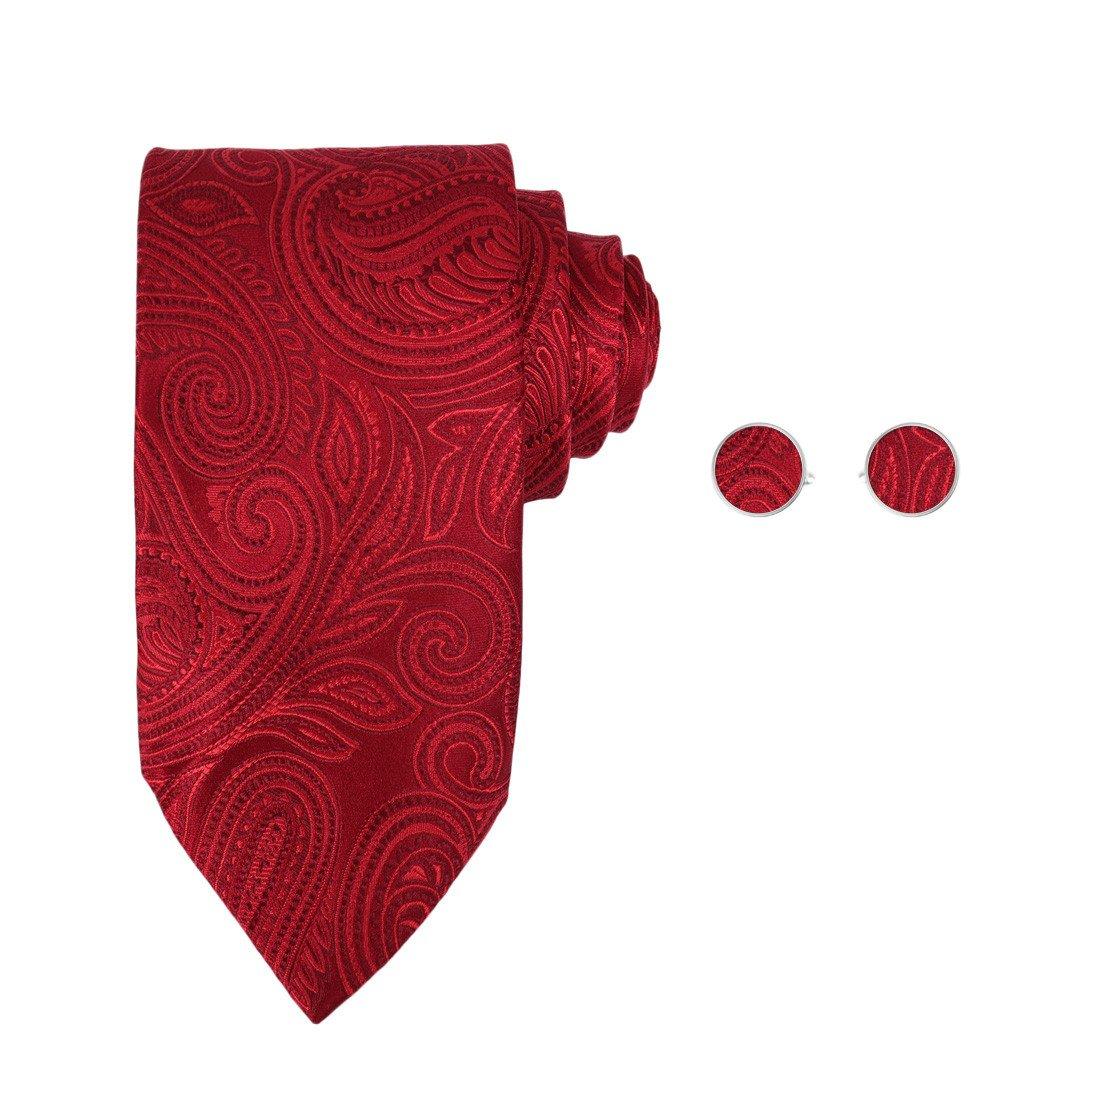 Y/&G Mens Fashion Multicolored Patterns Neckwear with Presents Box Silk Tie Cufflinks Set 2PT A1130